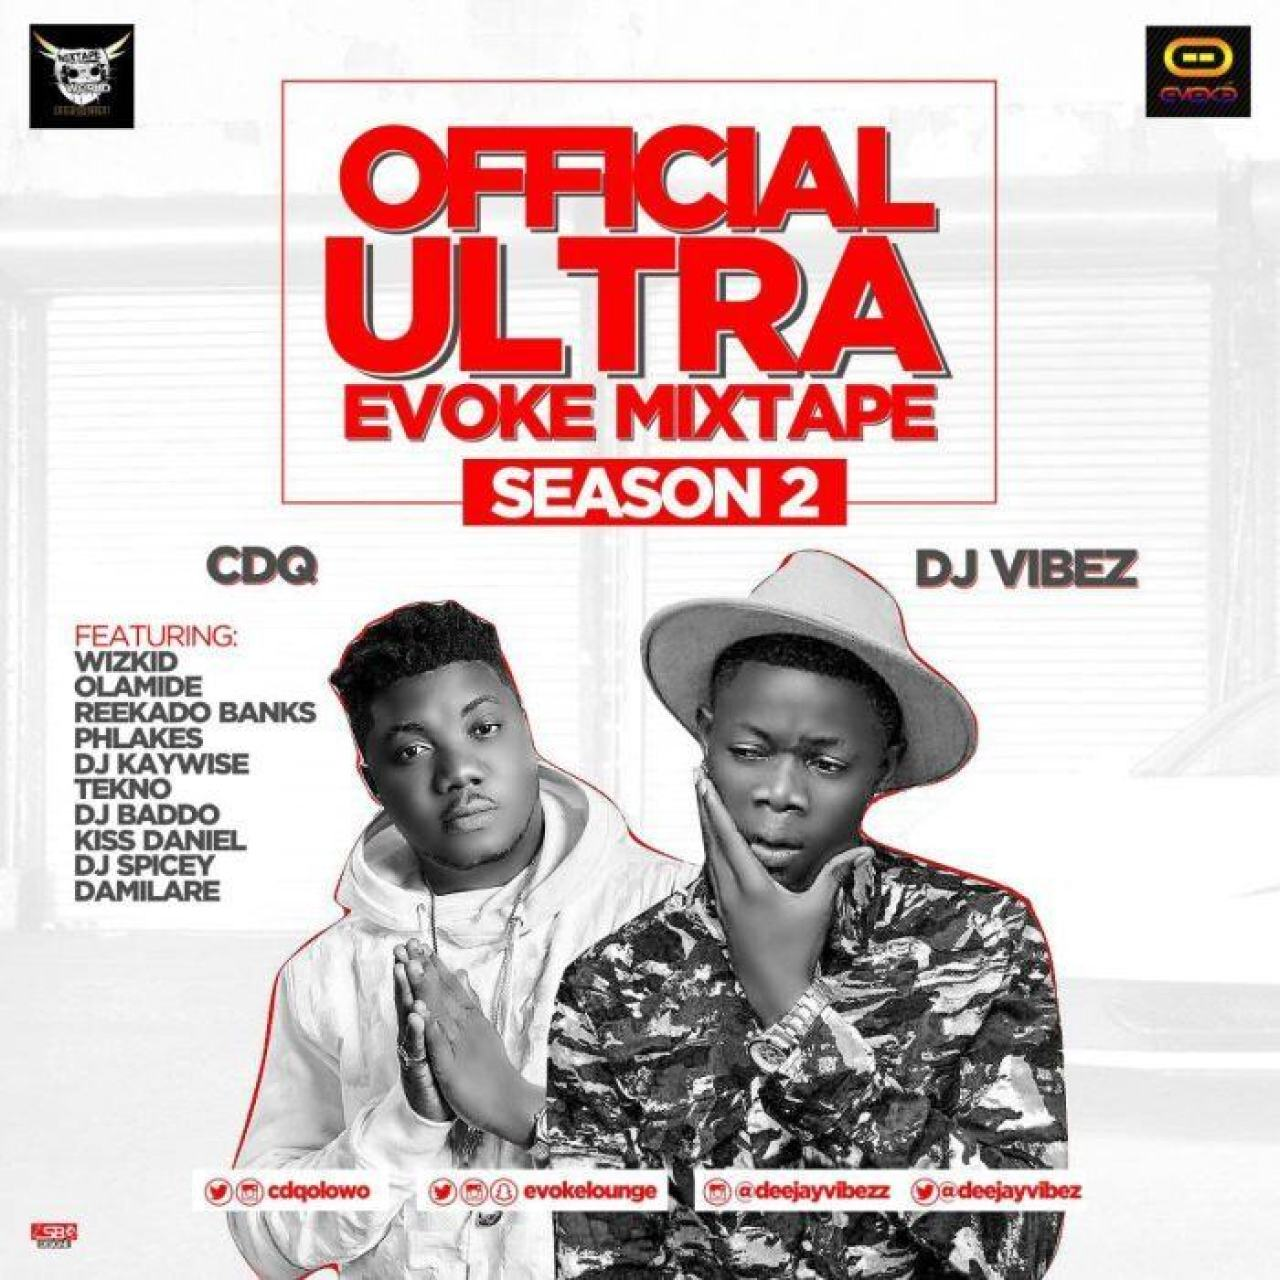 Dj Vibez - Ultra Evoke (Season Two) ft CDQ [MixTape]